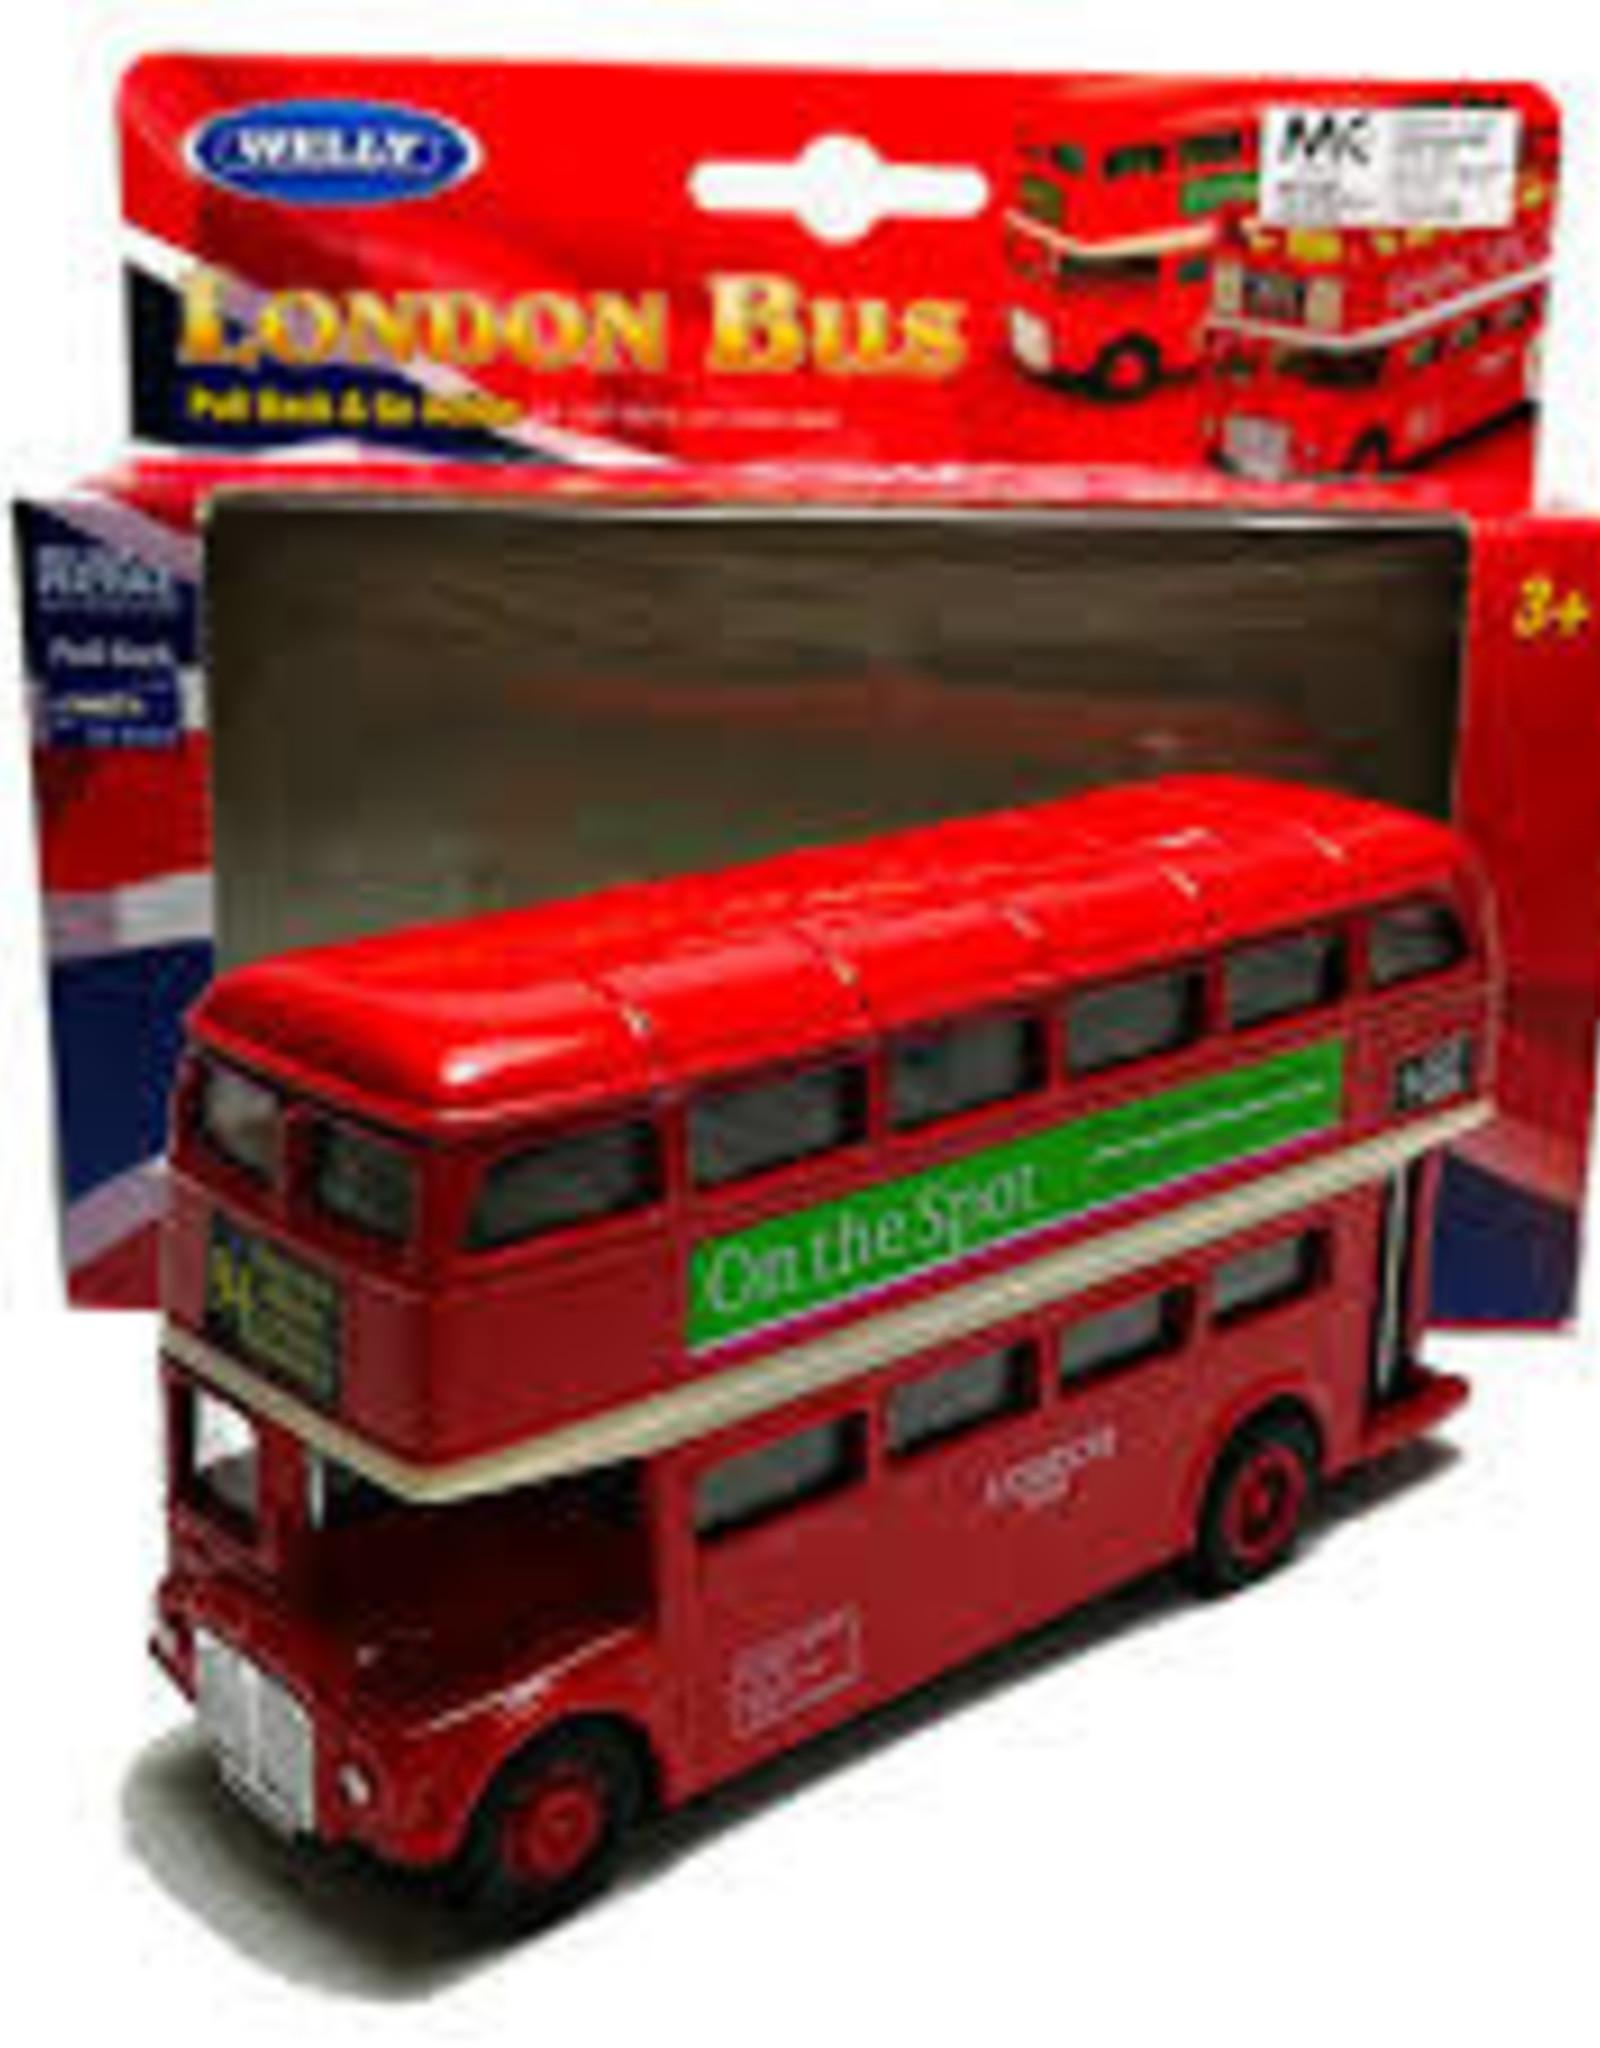 Playwell London Bus